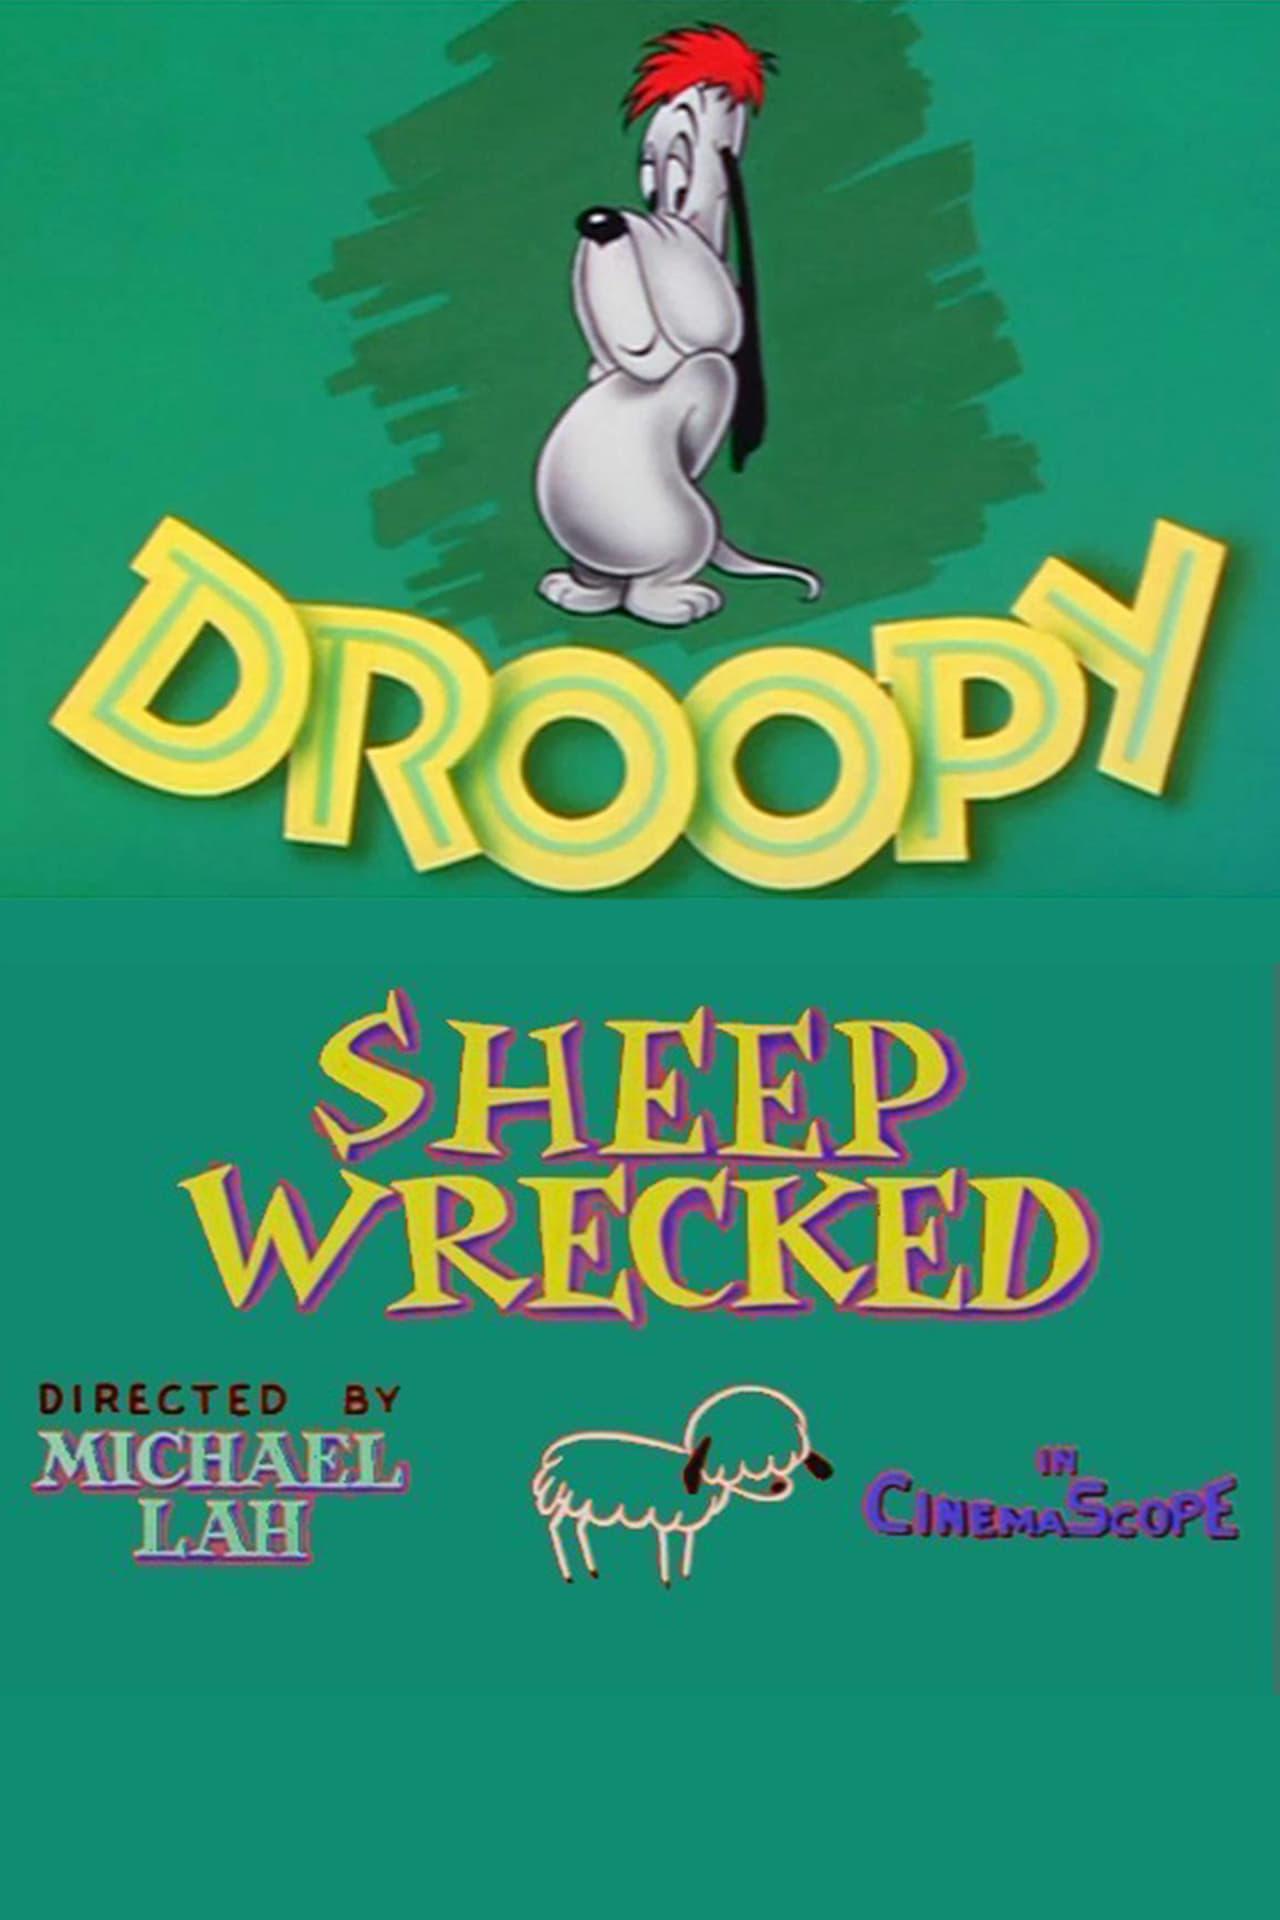 Sheep Wrecked